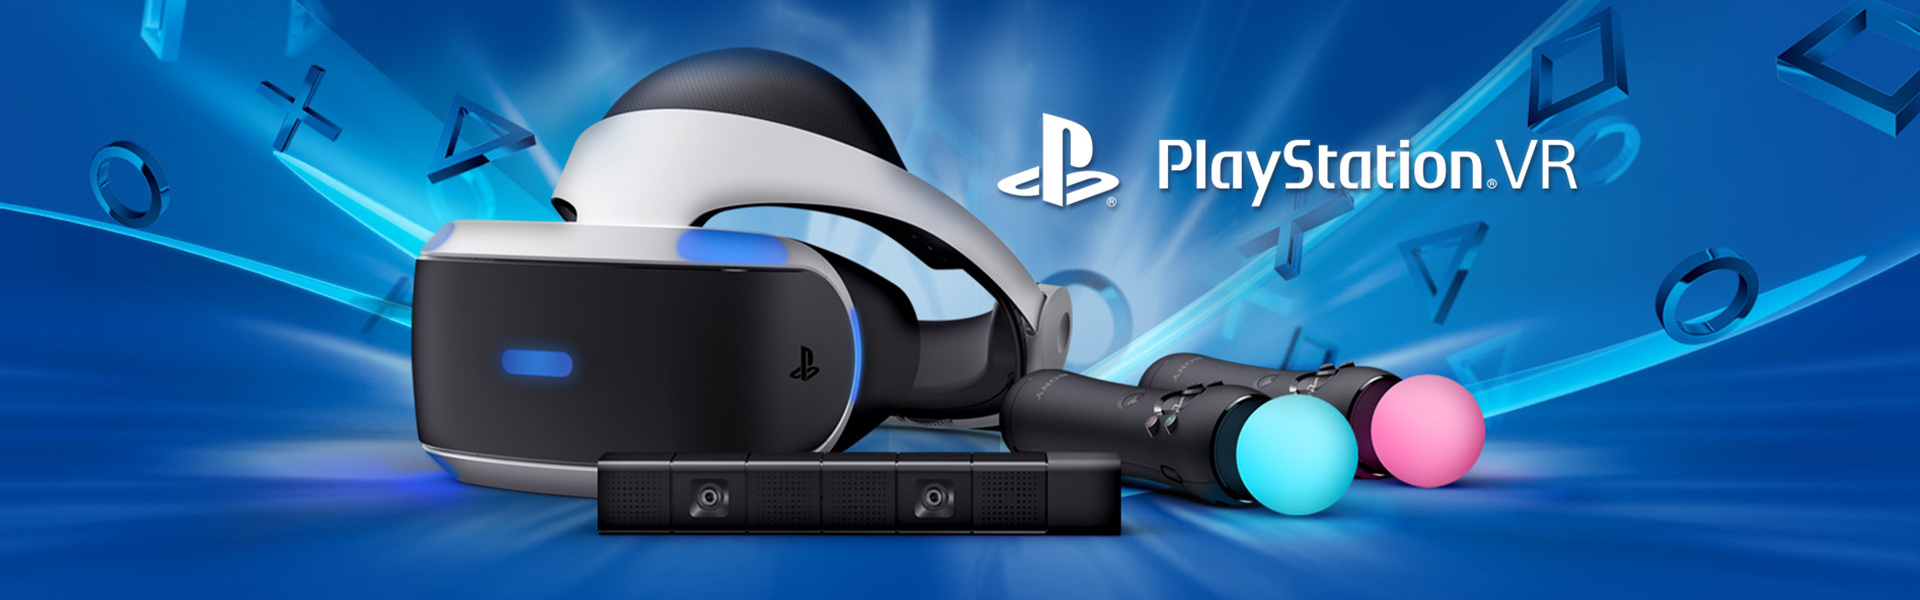 PlayStation VR MegaPack (PS4) [VR] PSN Key EUROPE